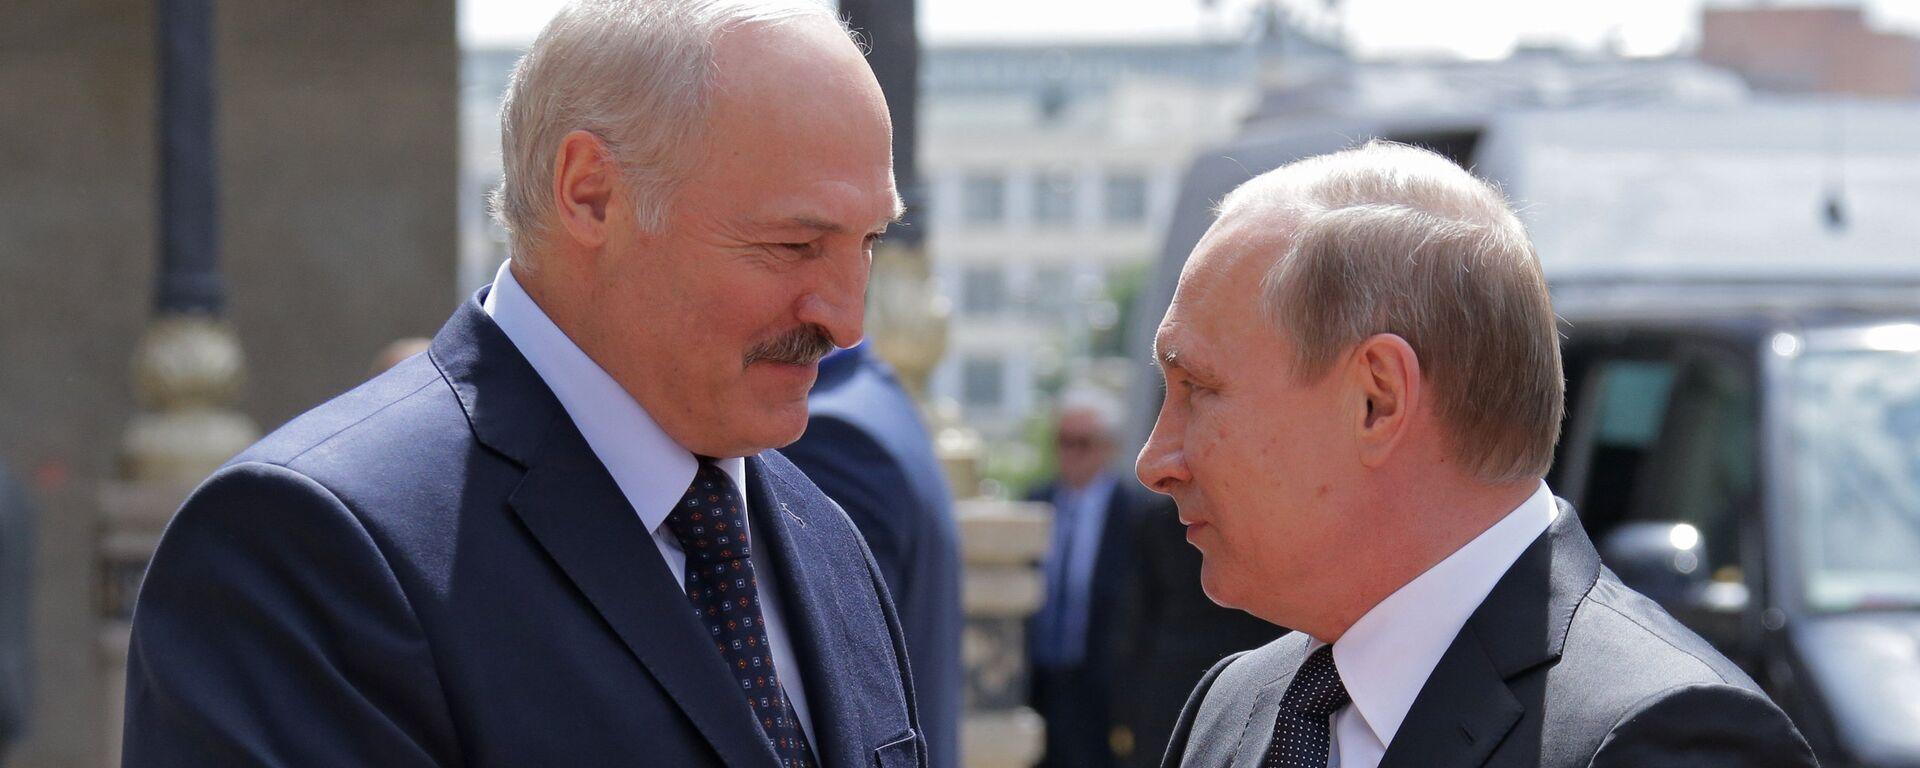 Президенты России и Беларуси Владимир Путин и Александр Лукашенко - Sputnik Latvija, 1920, 14.09.2021